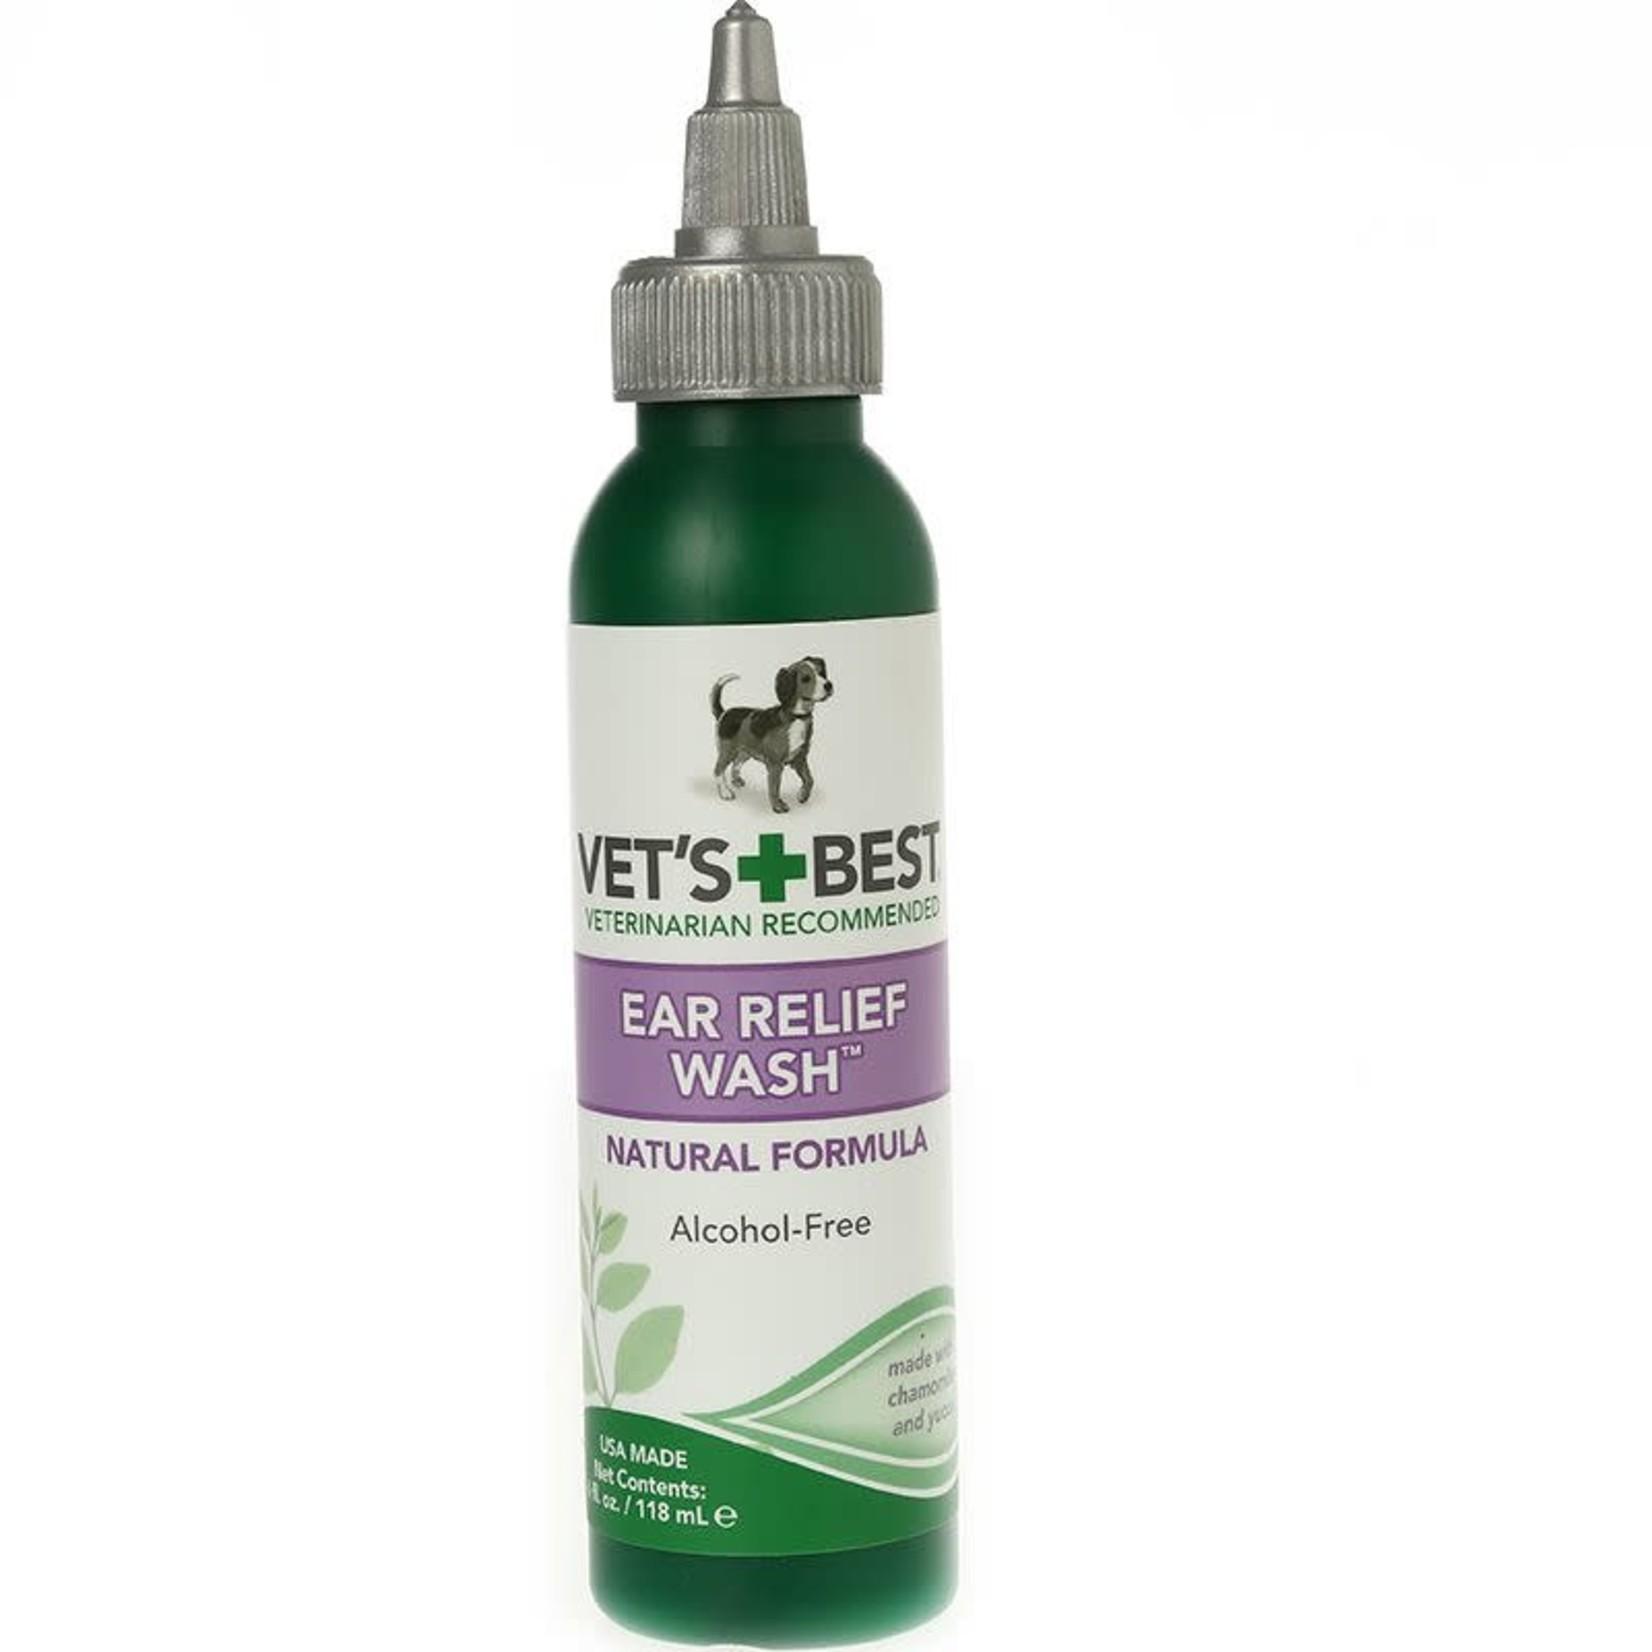 Vet's Best Vets Best Ear Relief Wash 4 OZ